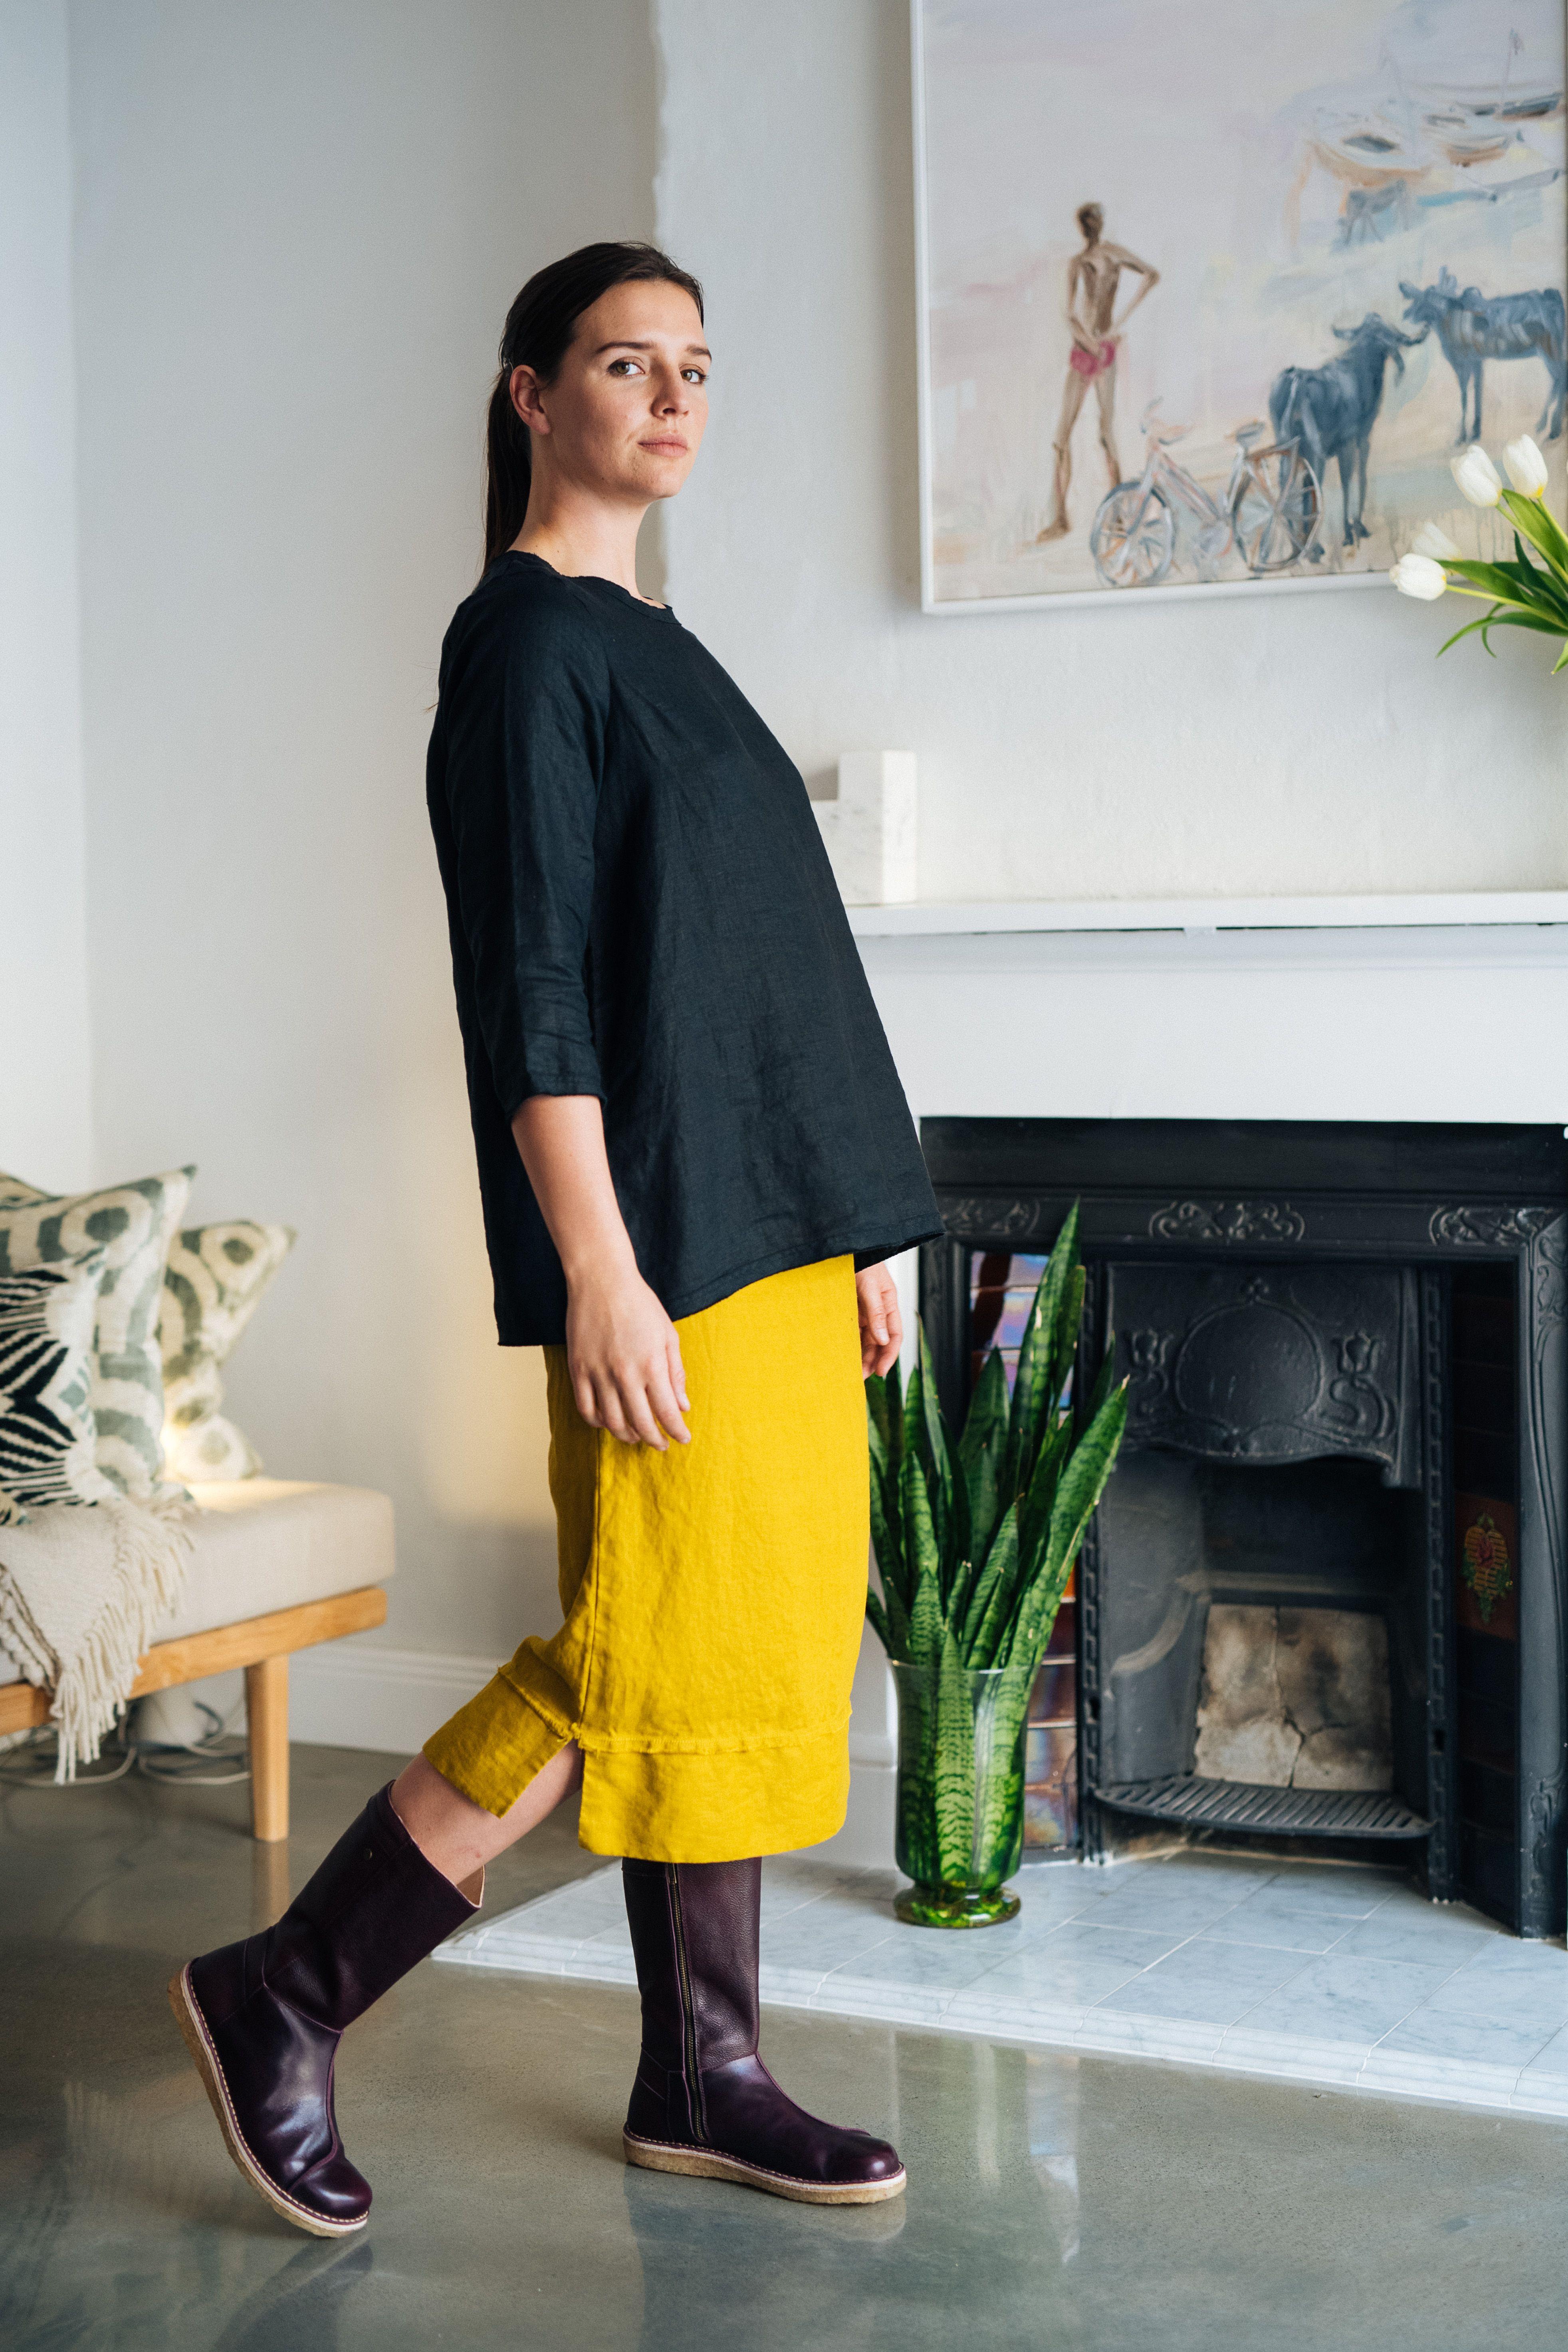 Chartreuse skirt, Fran top and Bota plum